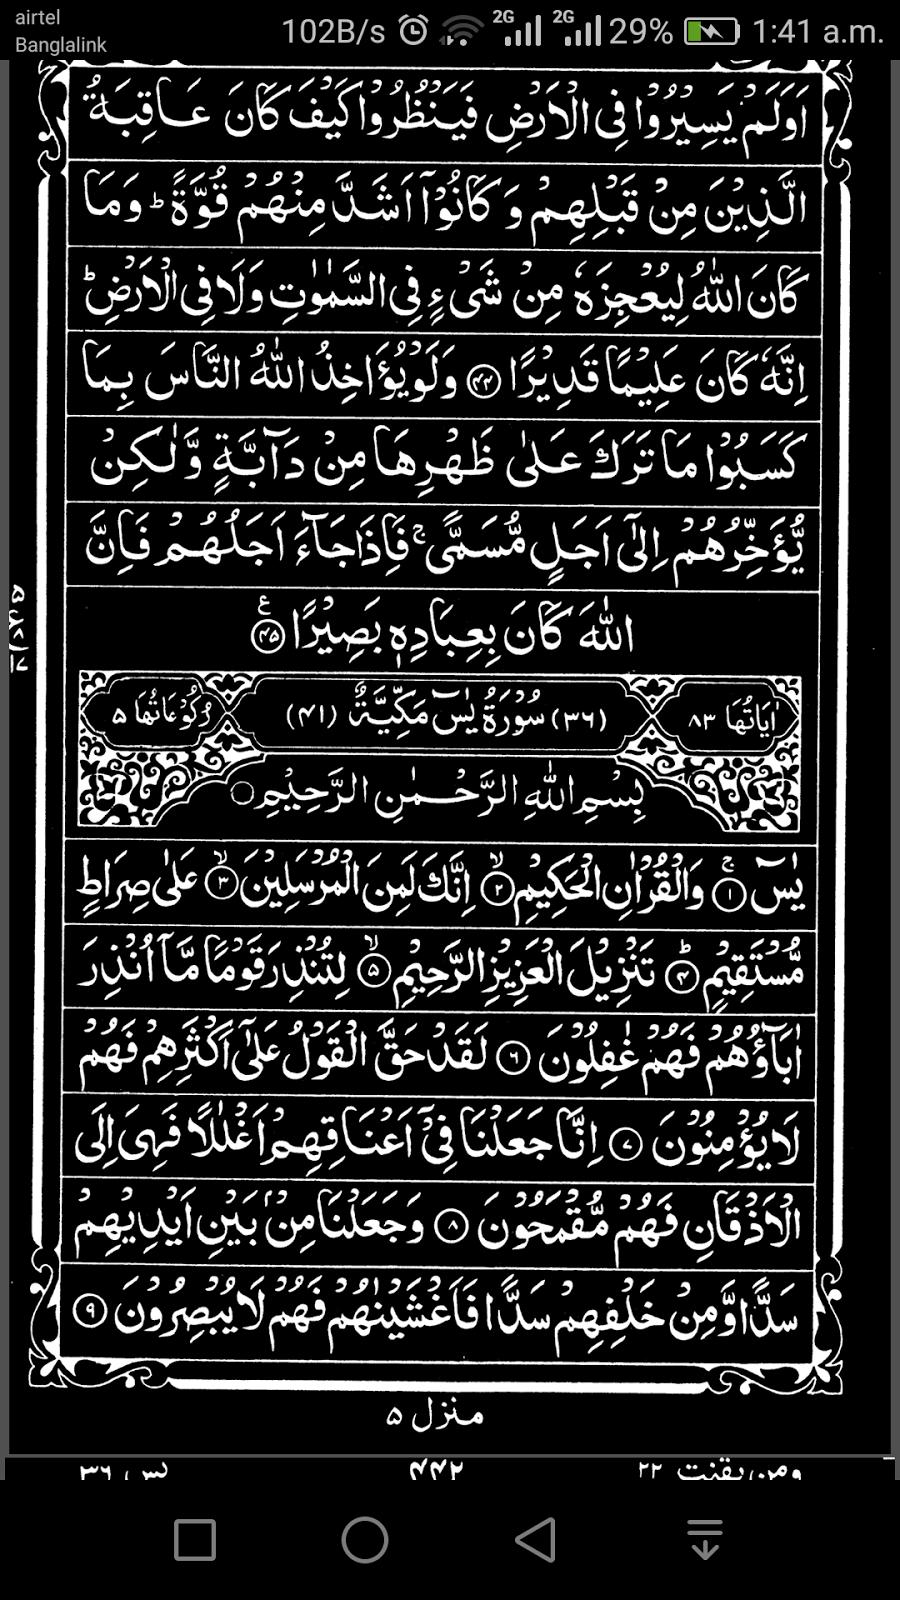 hafezi quran sharif pdf download